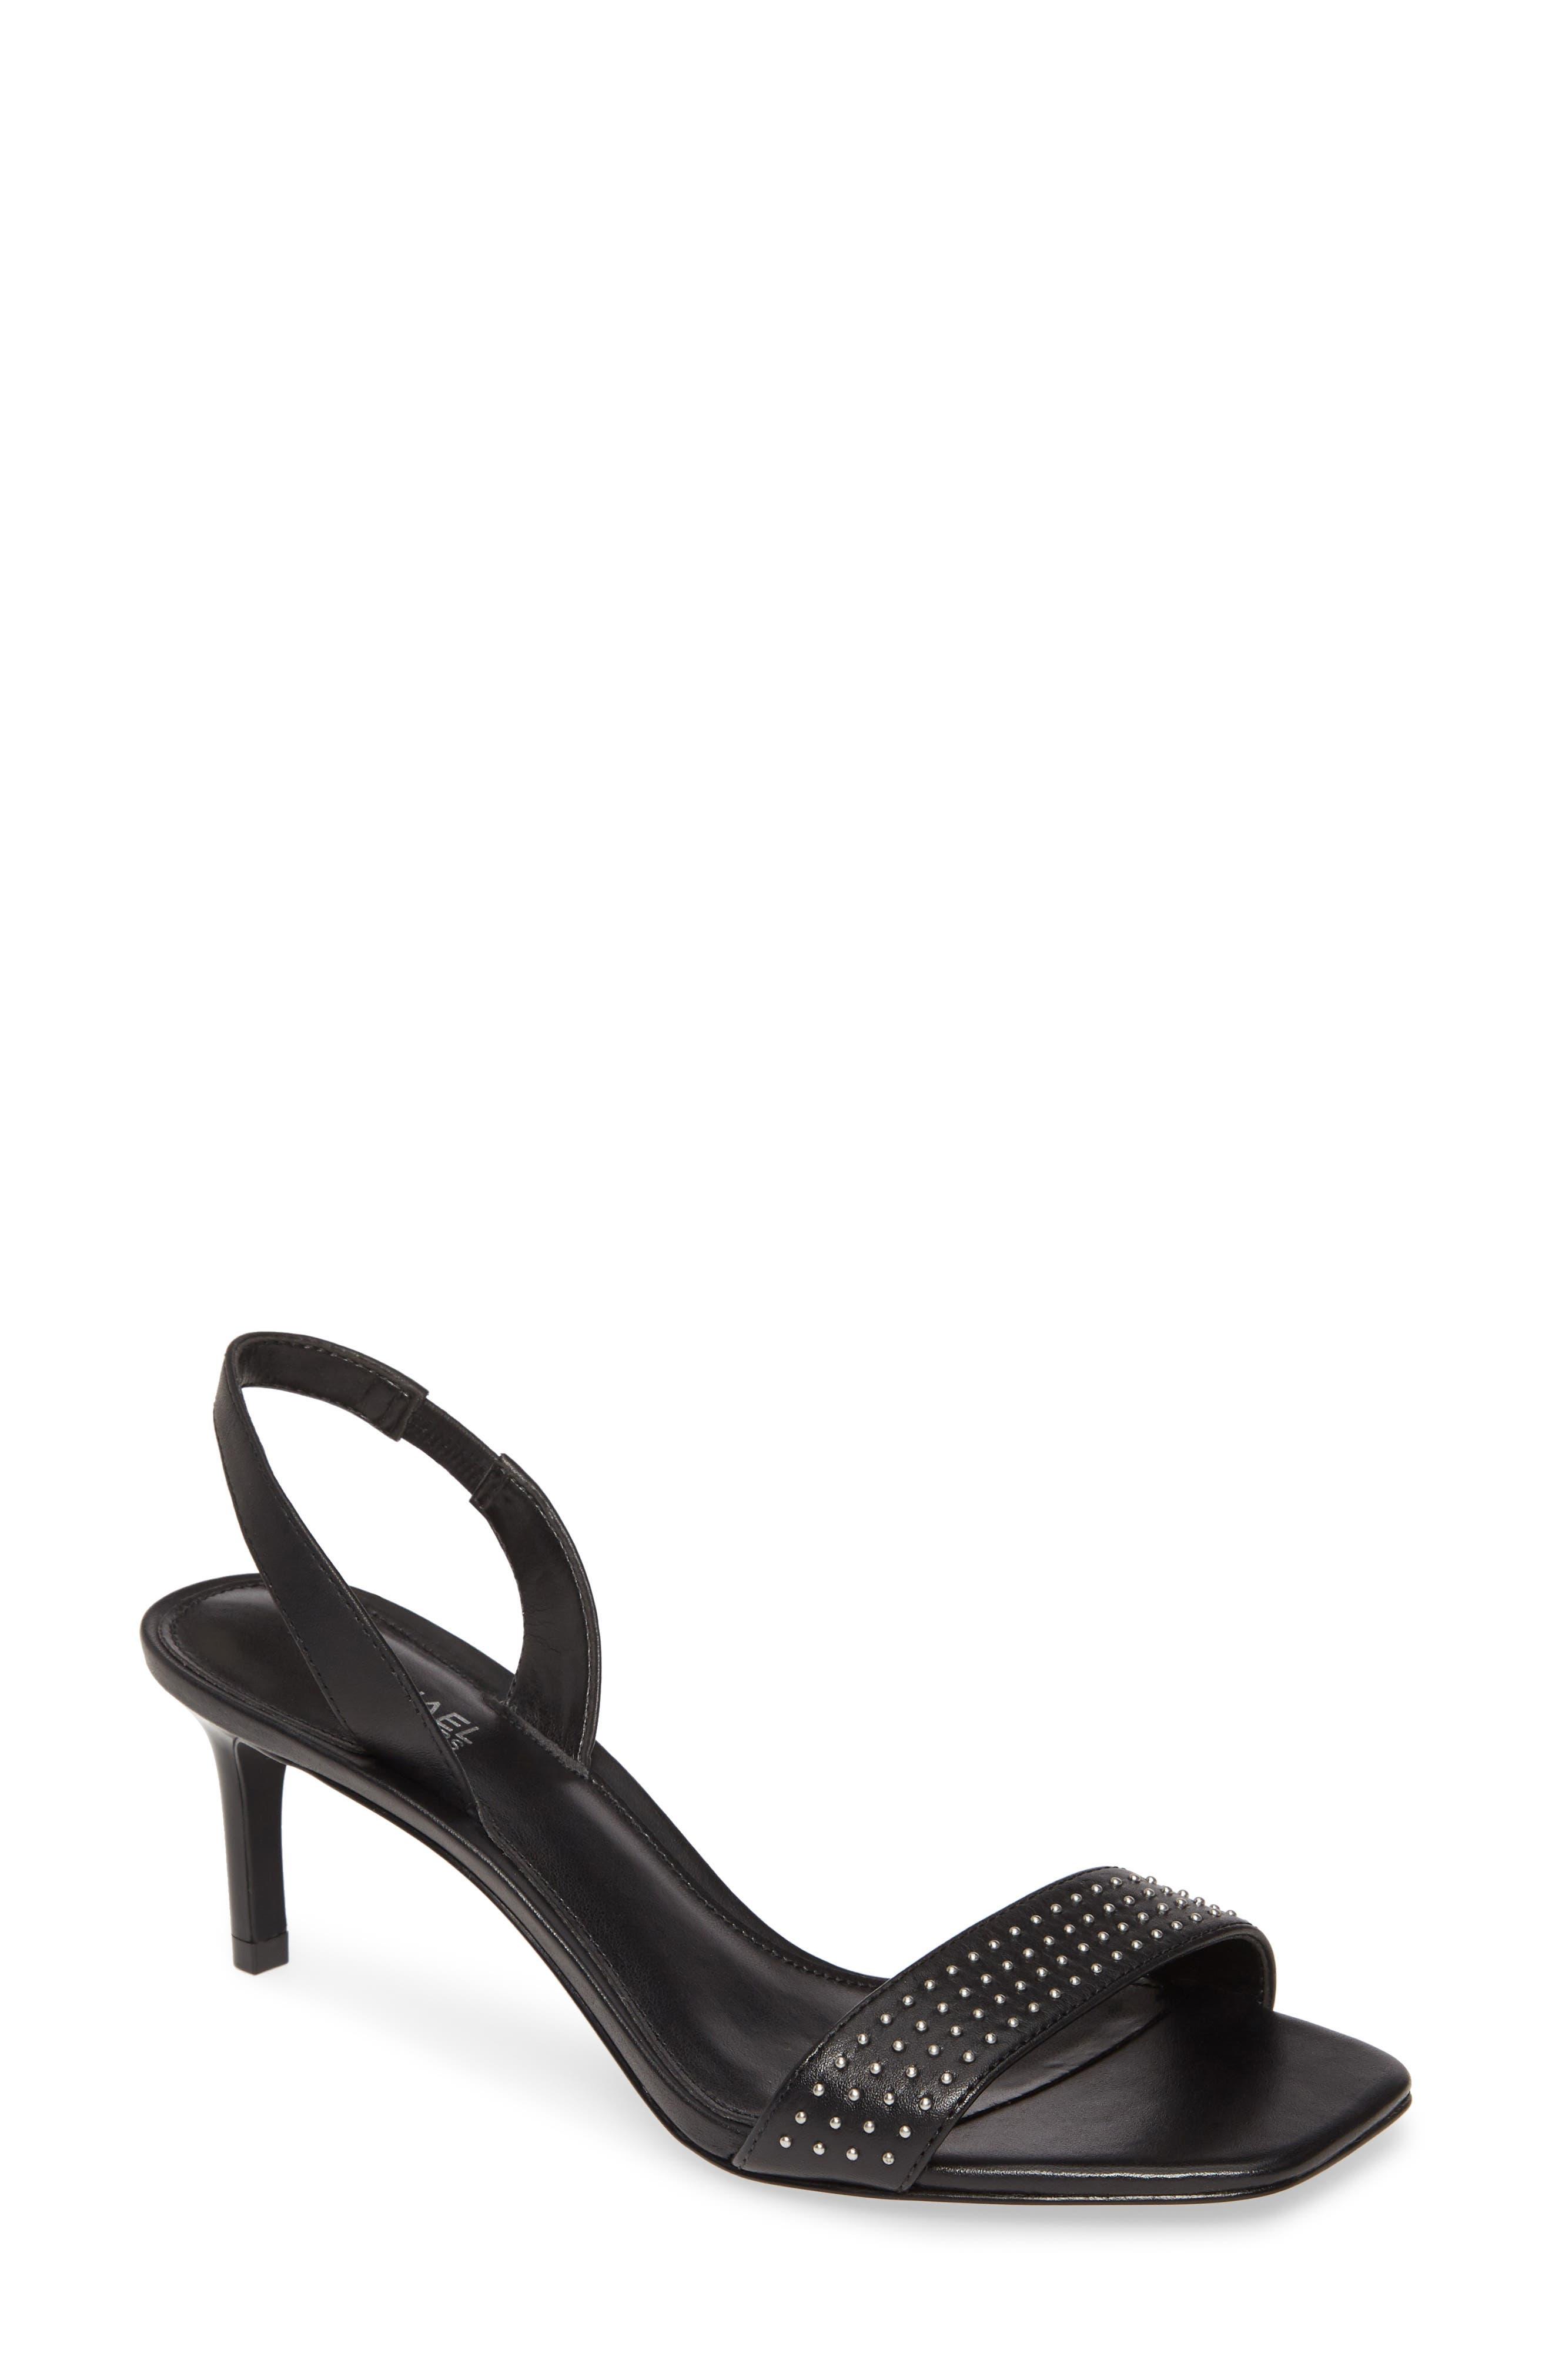 Mila Studded Leather Slingback Sandal